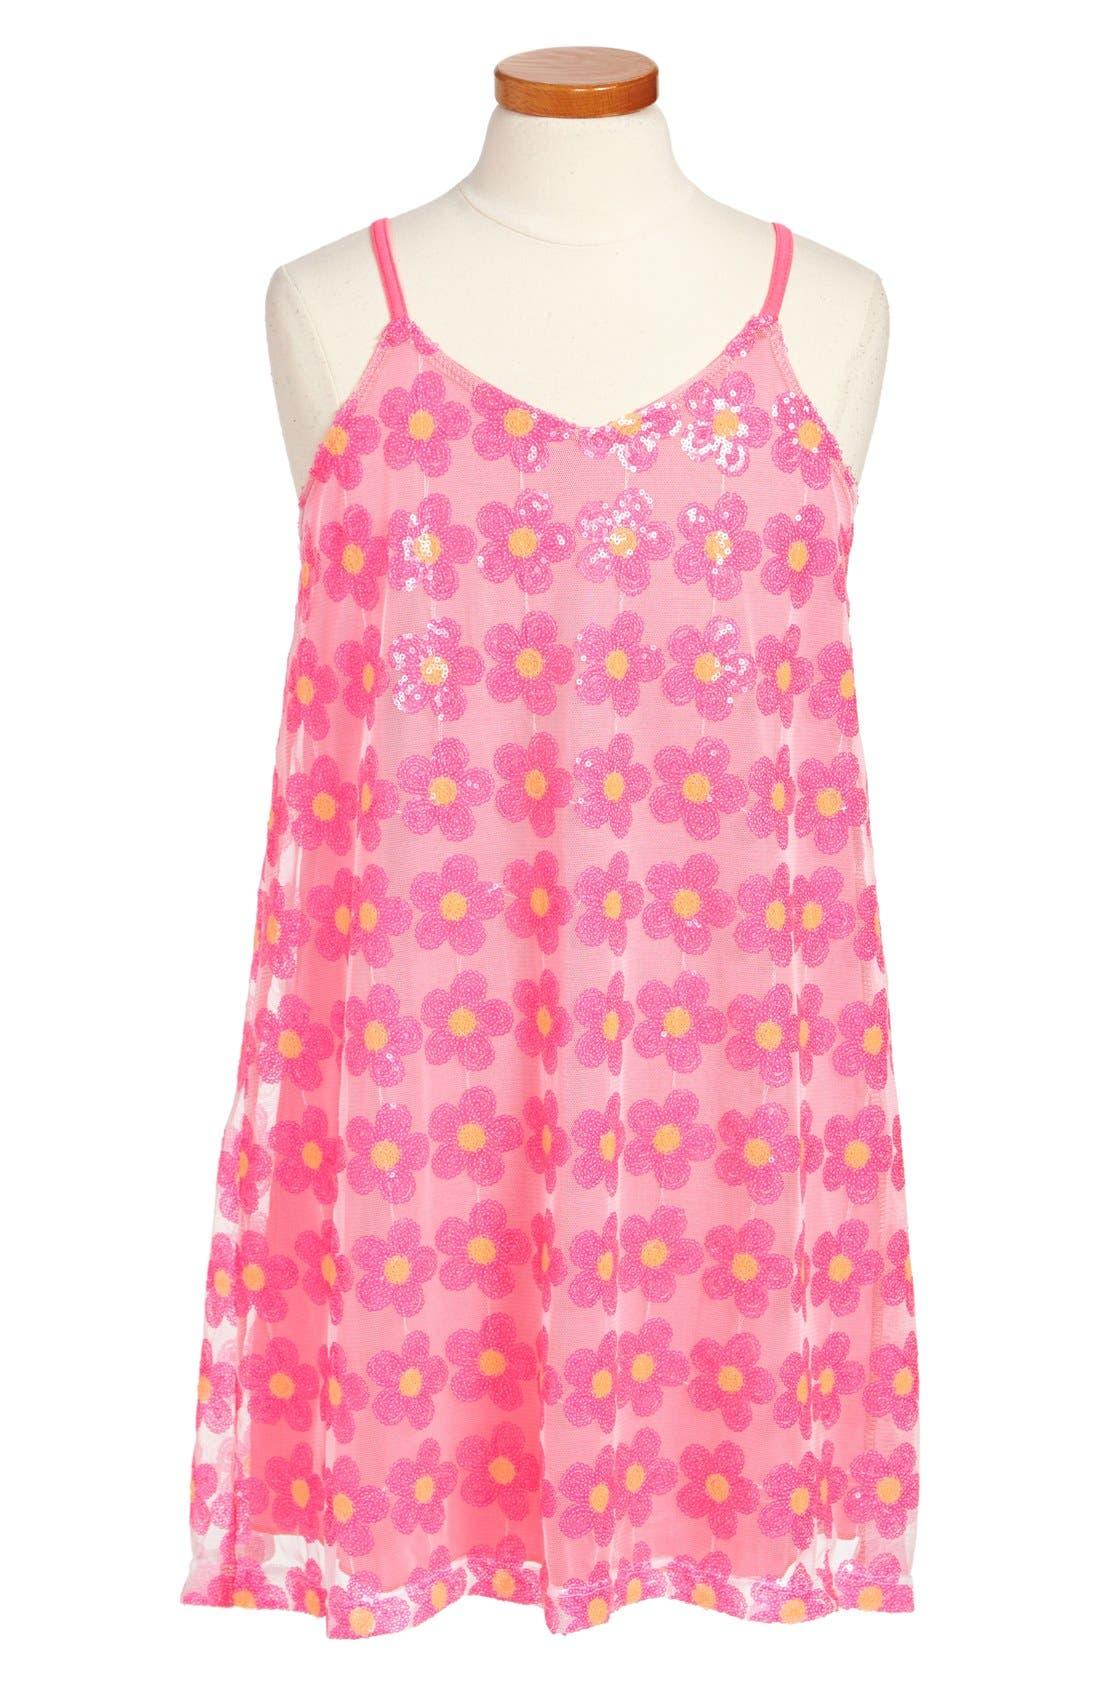 Main Image - Flowers by Zoe 'Daisy' Mesh Dress (Big Girls)